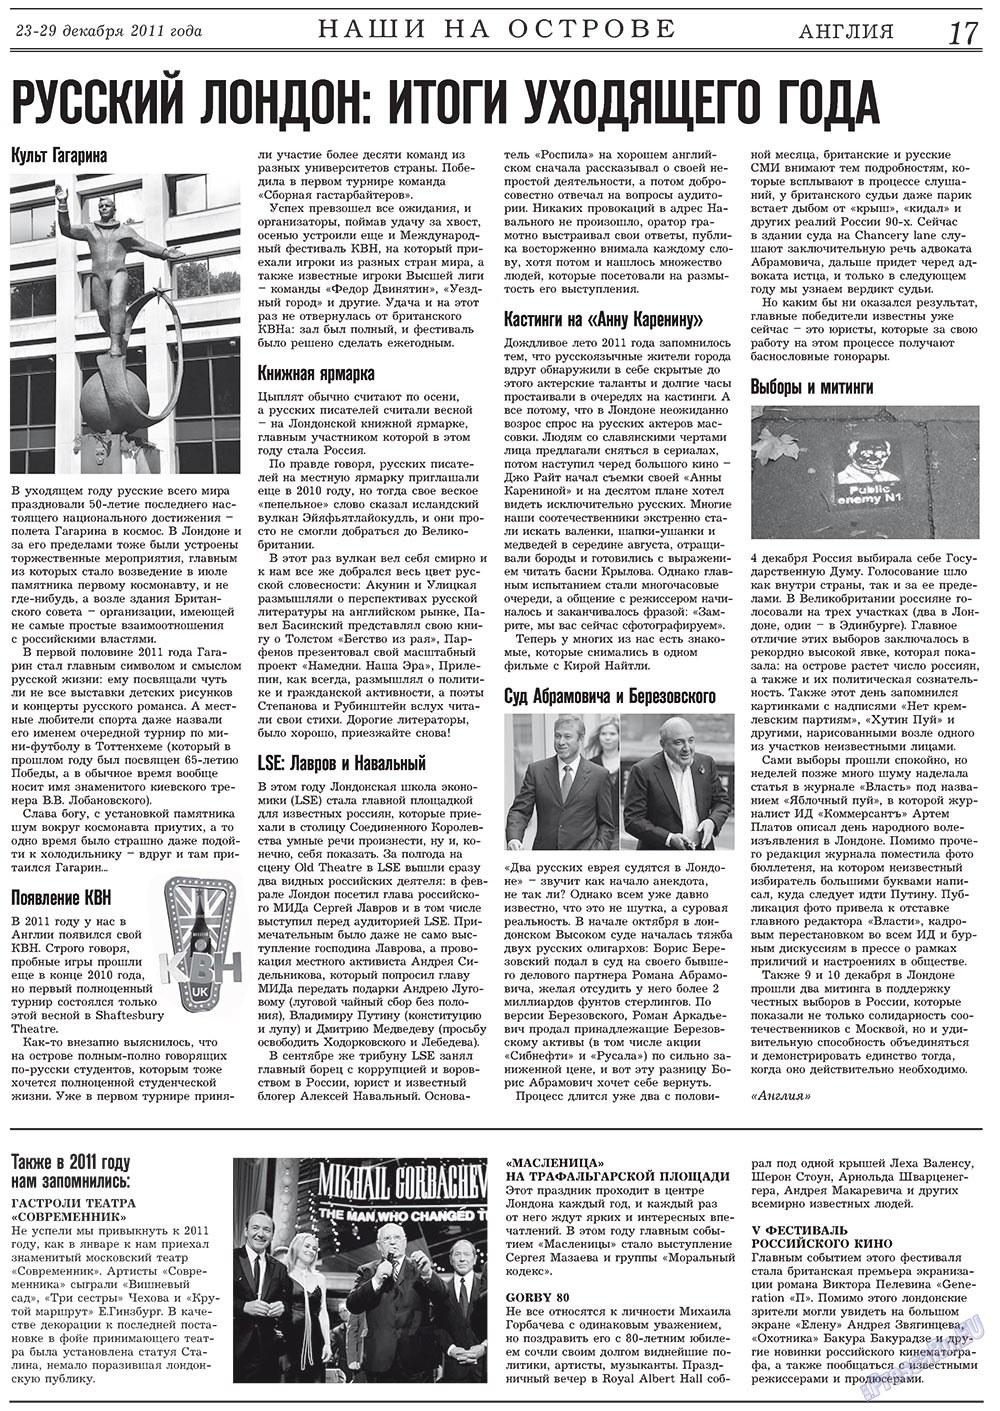 Англия (газета). 2011 год, номер 47, стр. 17